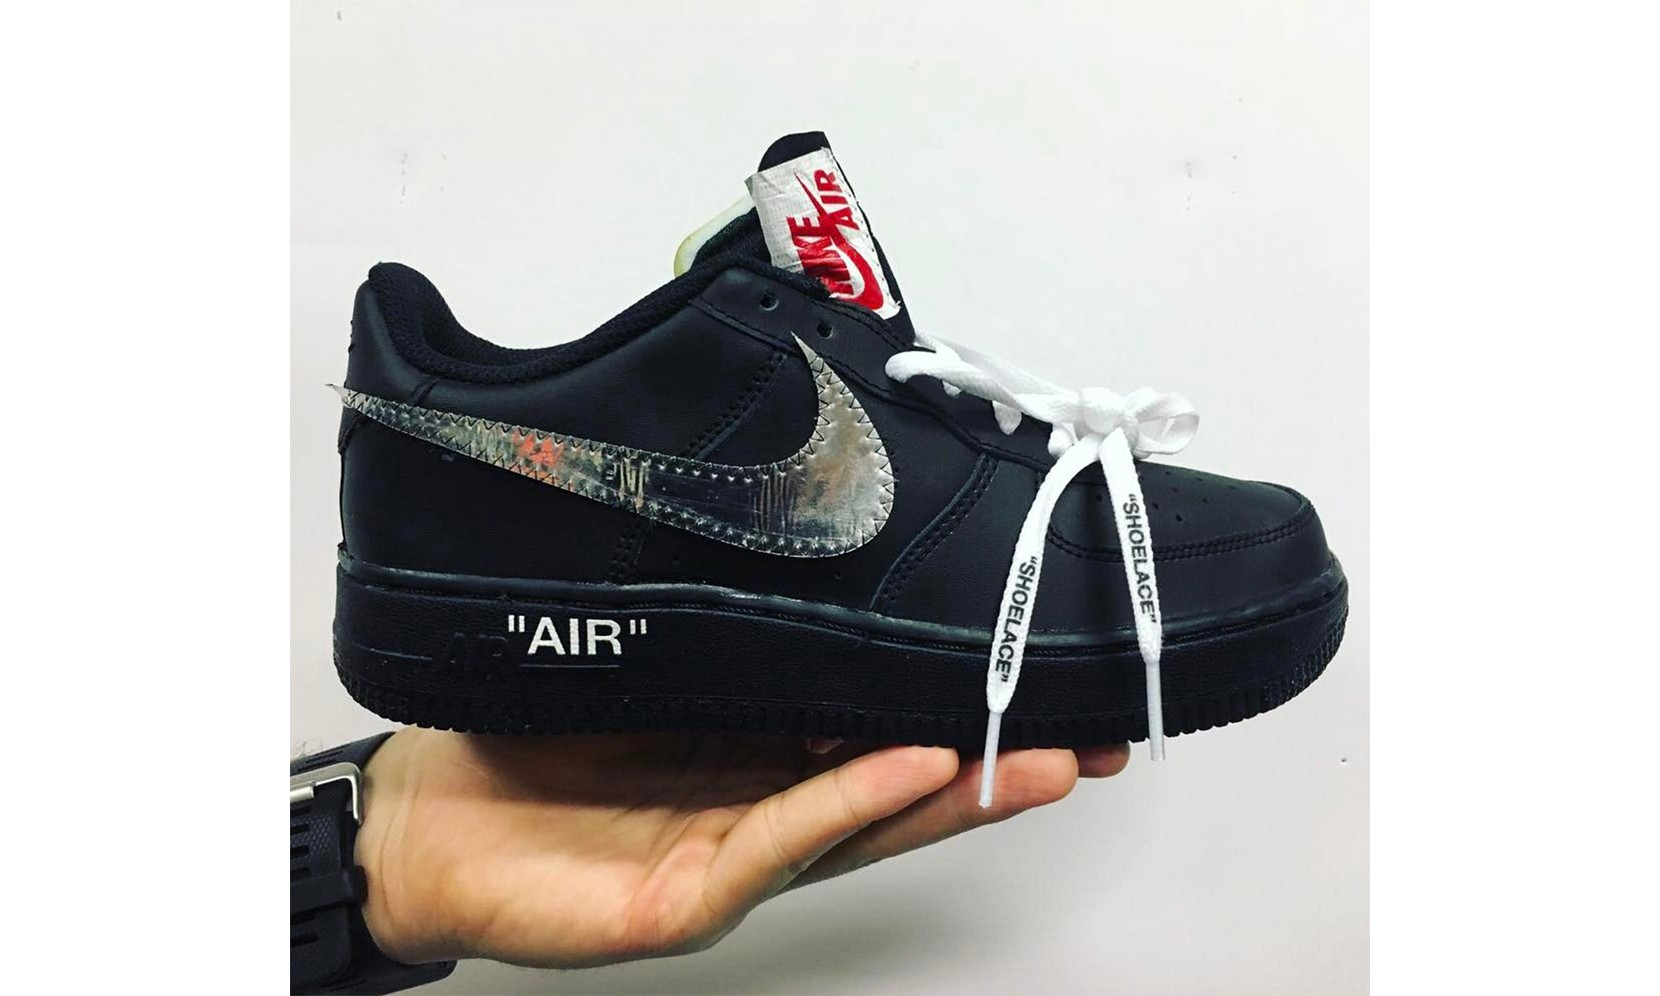 Virgil Abloh 又晒出这双 OFF-WHITE x Nike Air Force 1 眼馋你们了